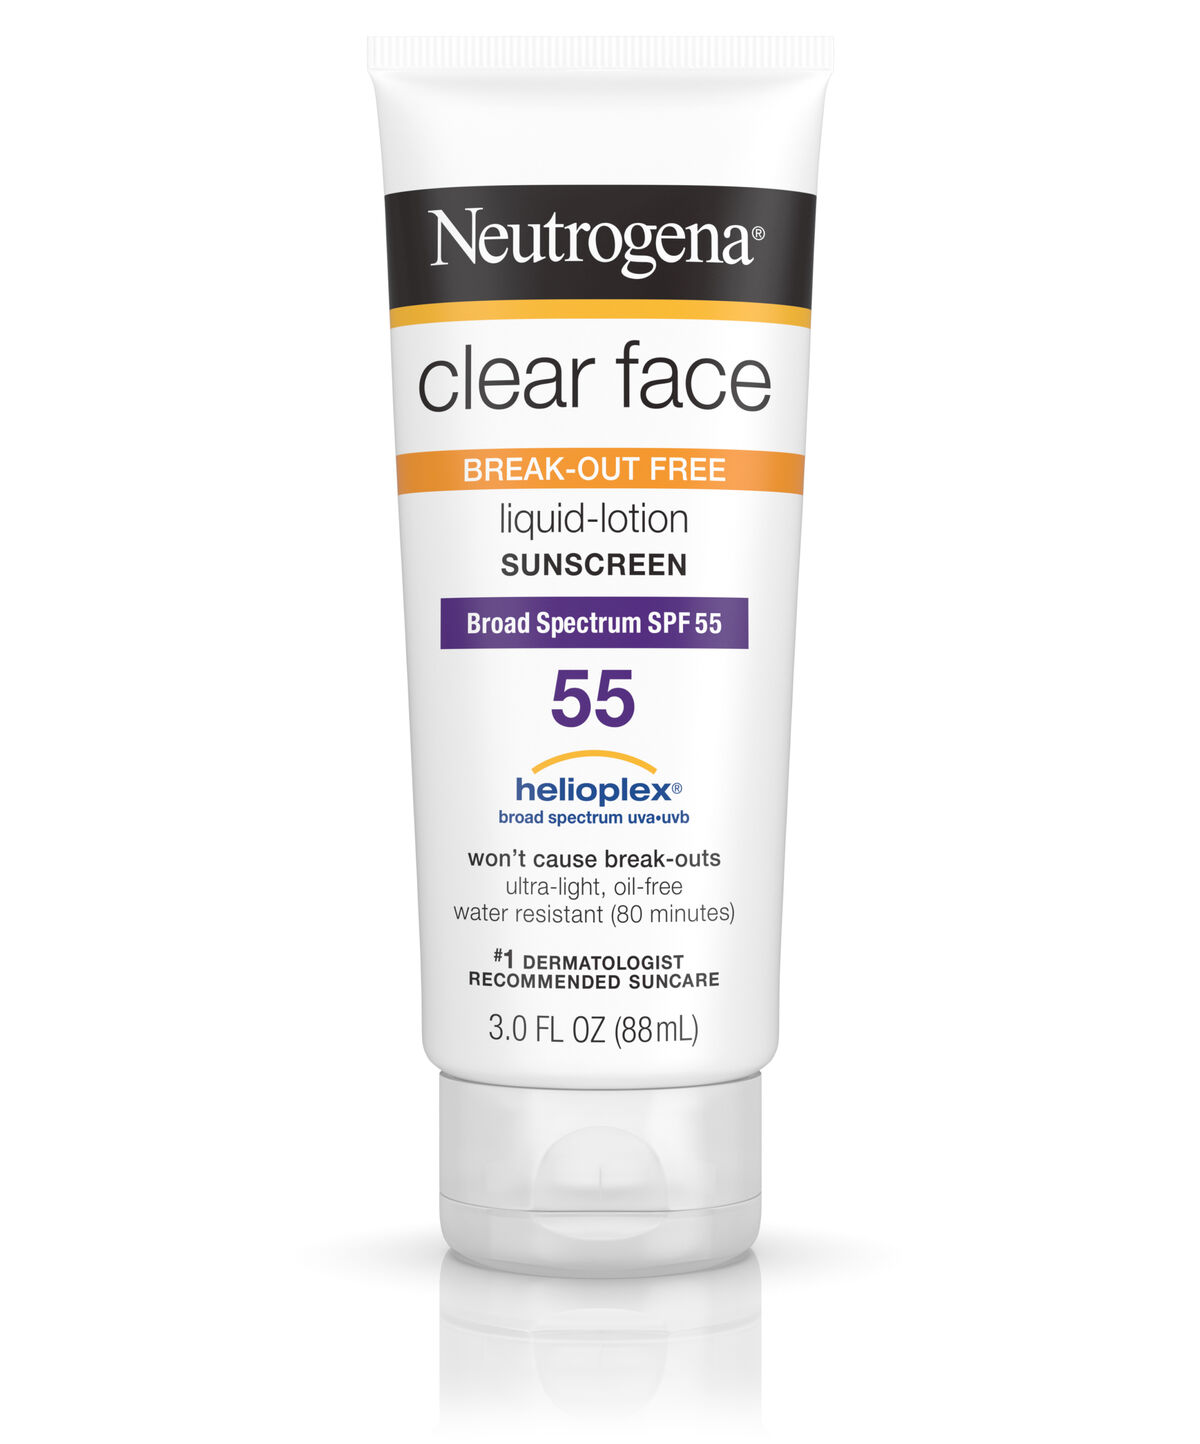 neutrogena clear face sunscreen review